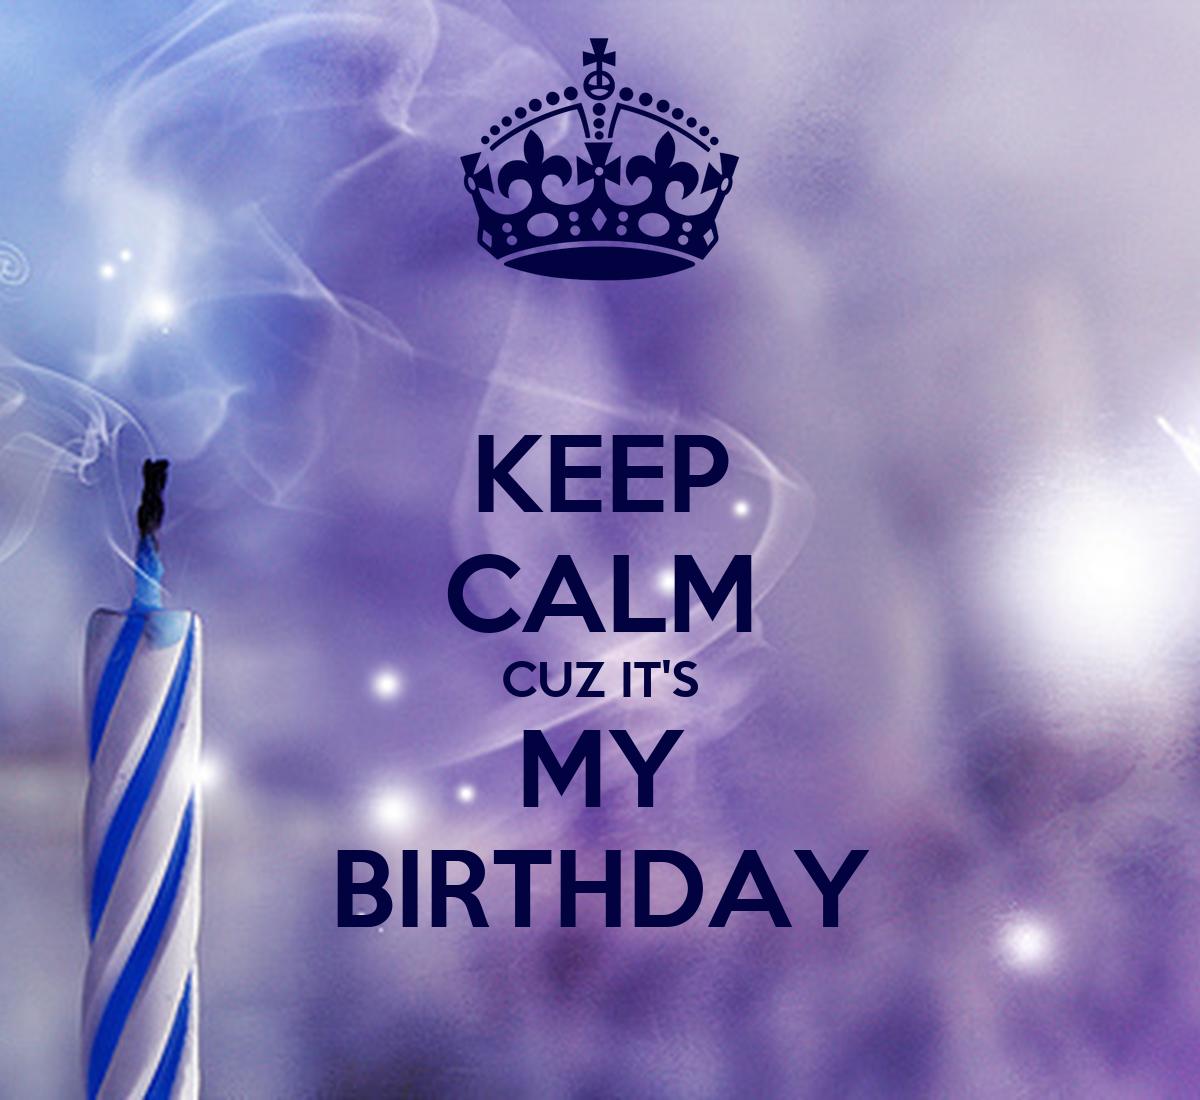 KEEP CALM CUZ IT'S MY BIRTHDAY Poster | Addison | Keep ...